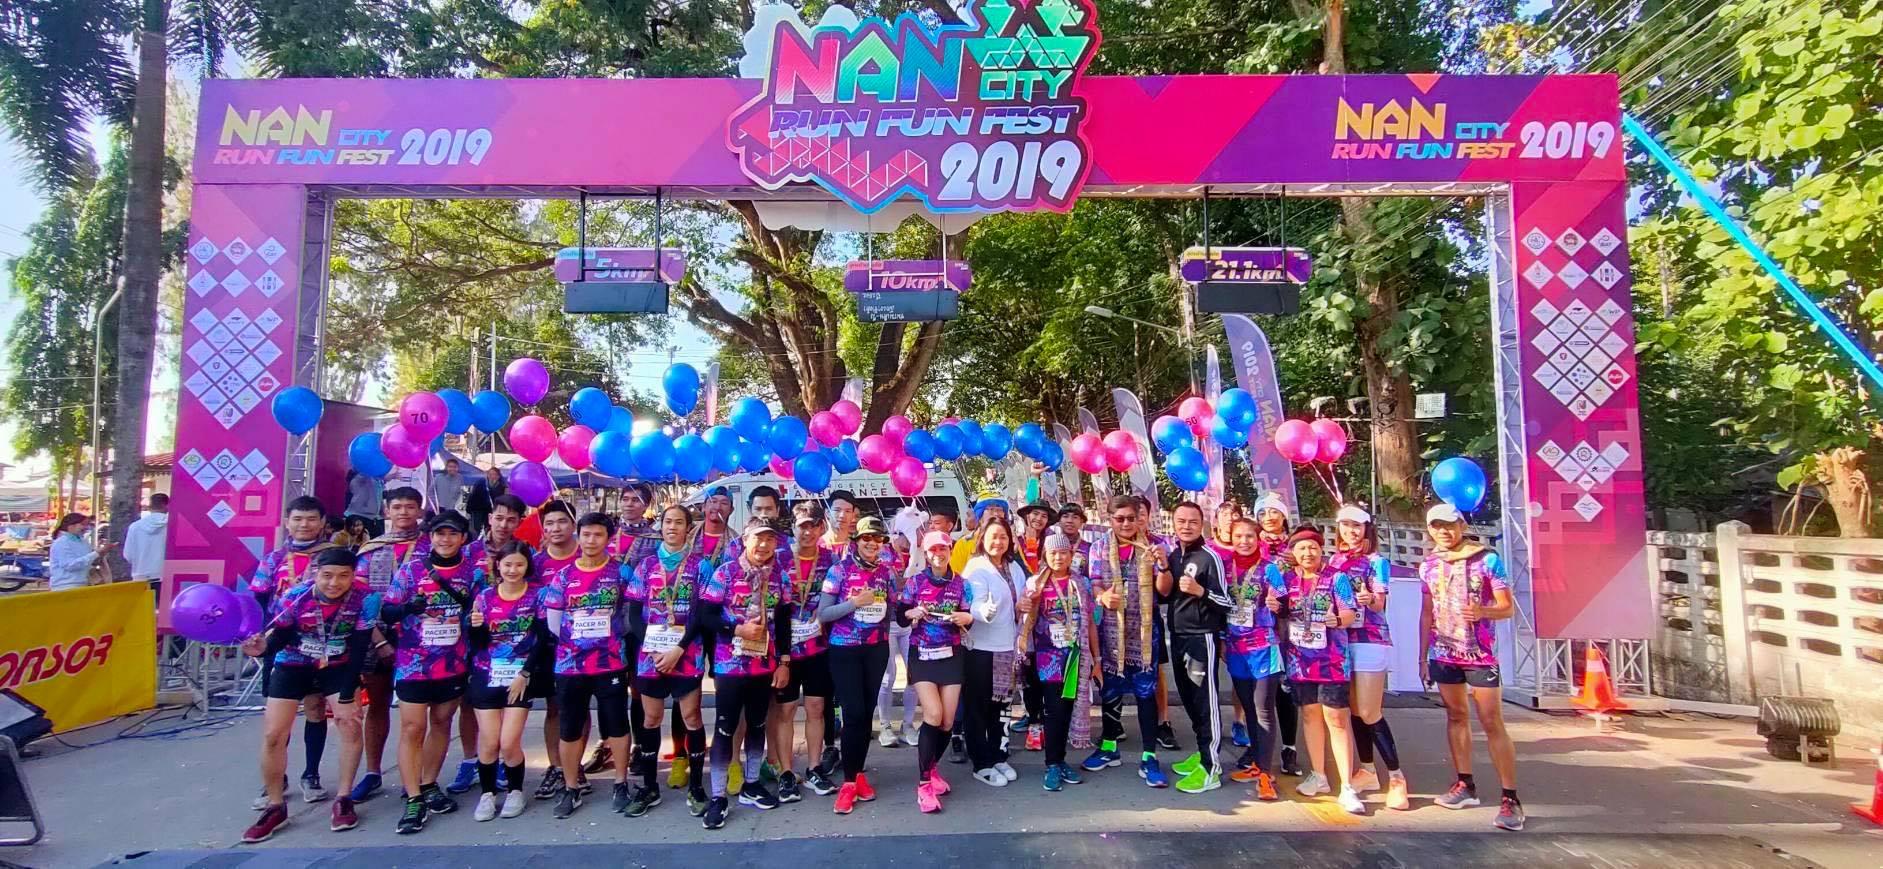 TIP ร่วมส่งเสริมการท่องเที่ยว กระตุ้นเศรษฐกิจชุมชน ร่วมจัดงาน NAN City Run Fun Fest 2019